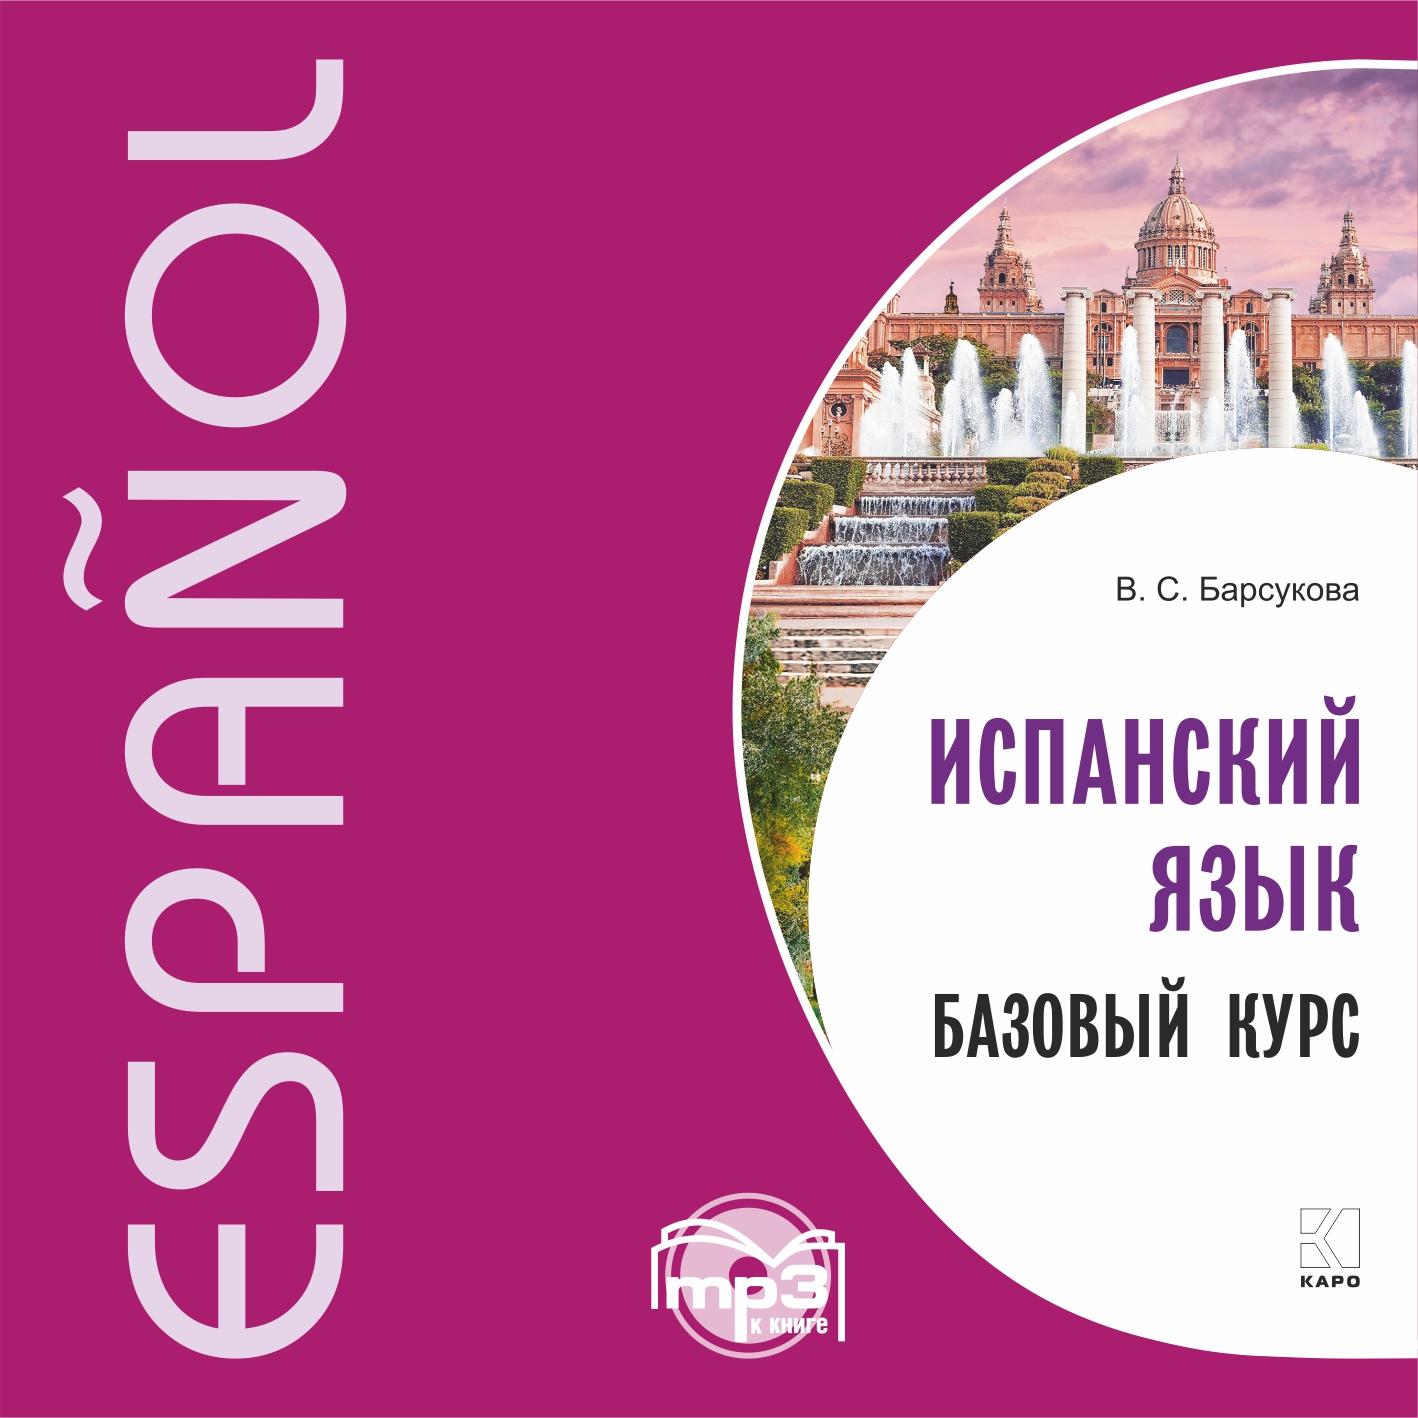 В. С. Барсукова Испанский язык. Базовый курс. MP3 барсукова в с испанский язык базовый курс диск мр3